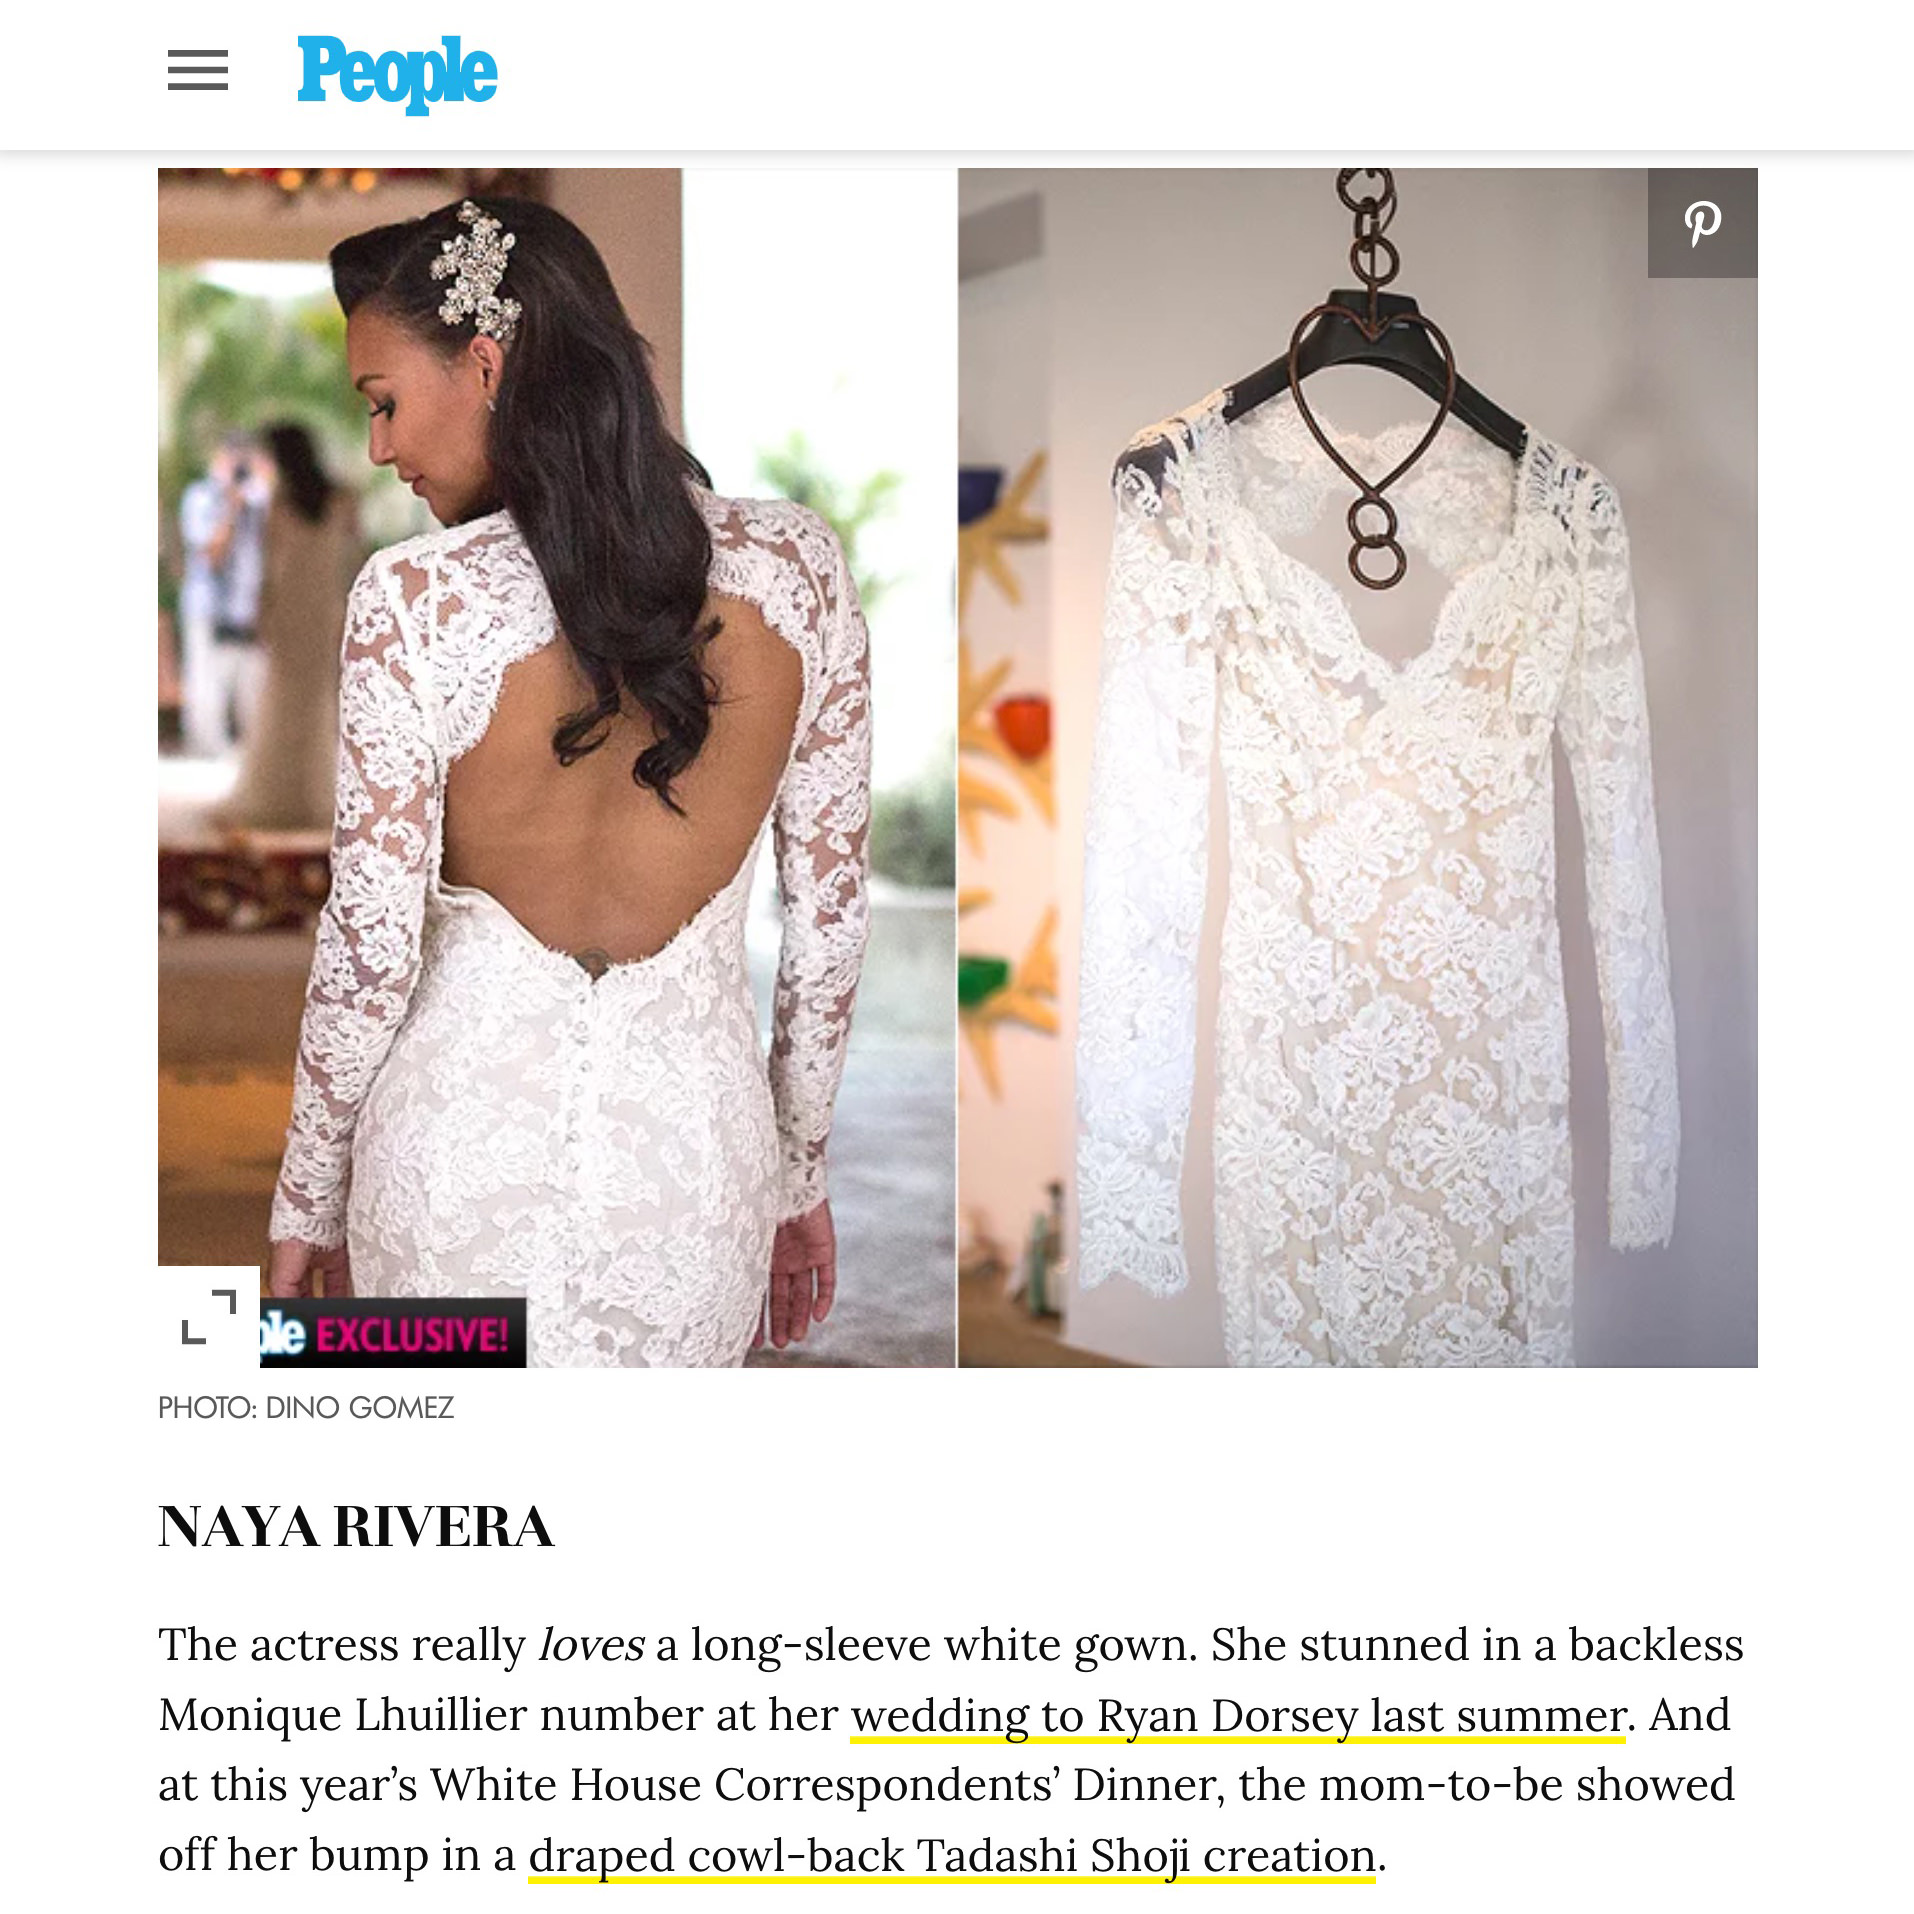 Naya Rivera Magazine Article